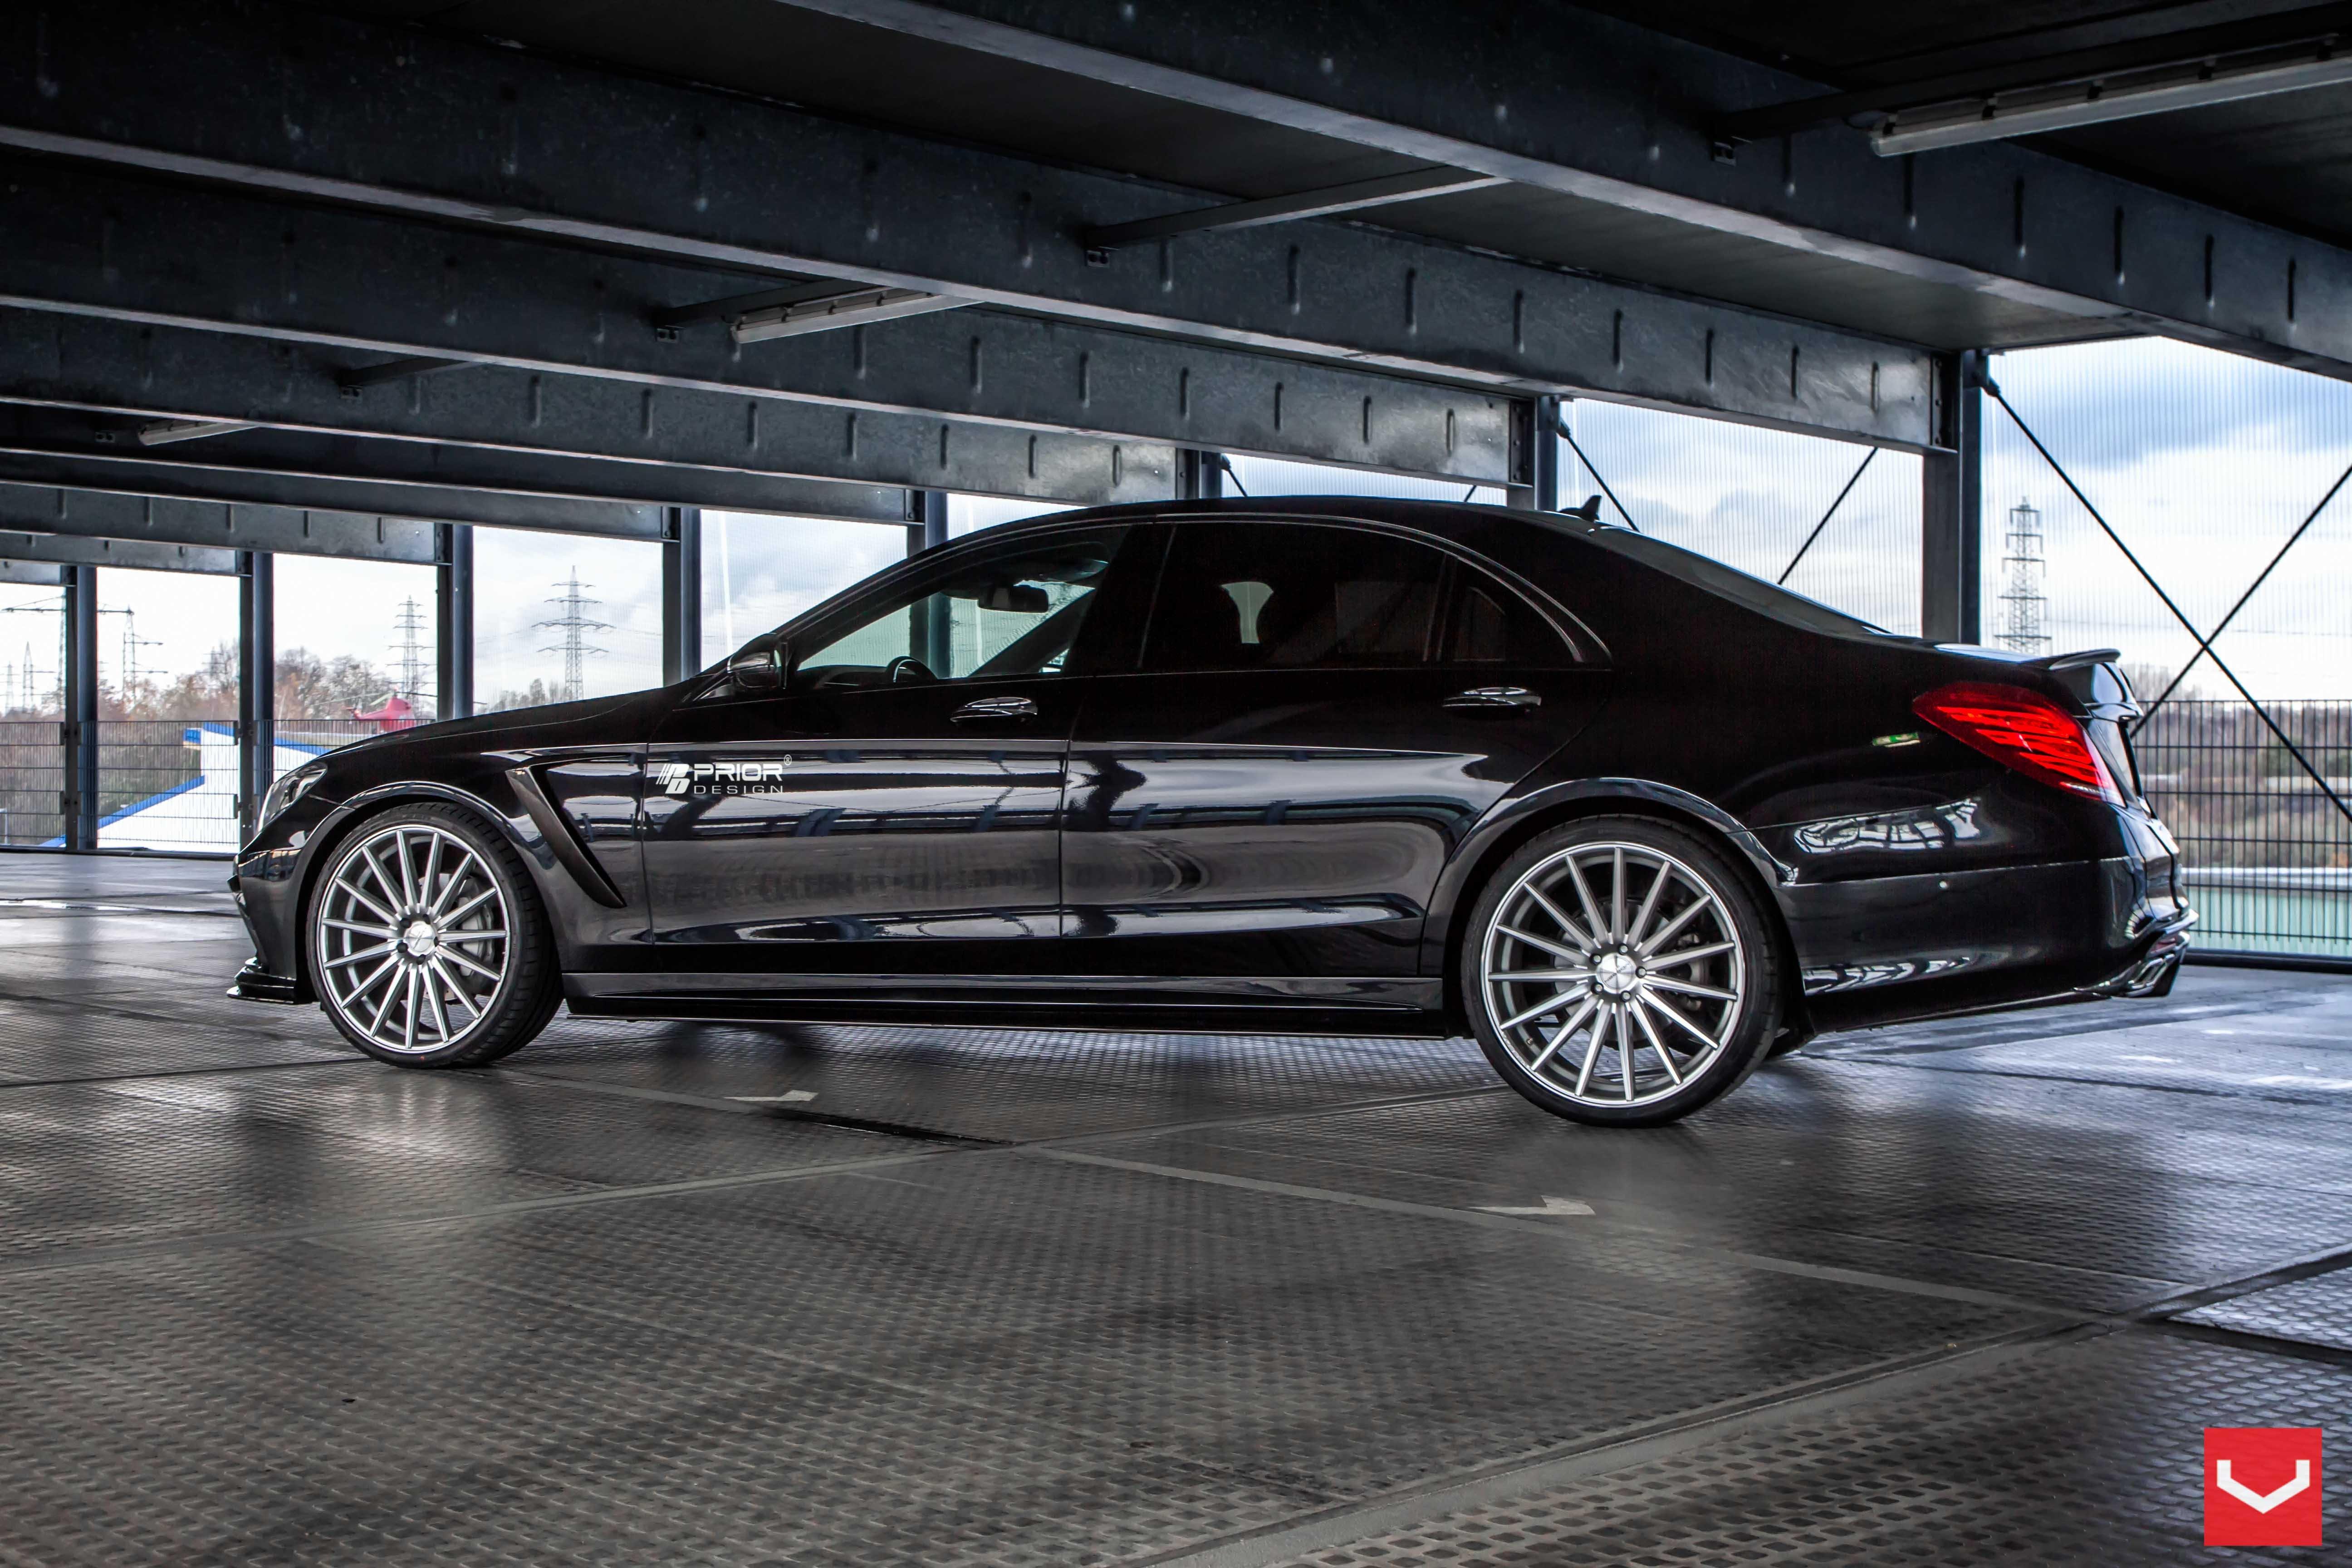 Mercedes benz s class vossen wheels tuning cars wallpaper for Mercedes benz s class rims